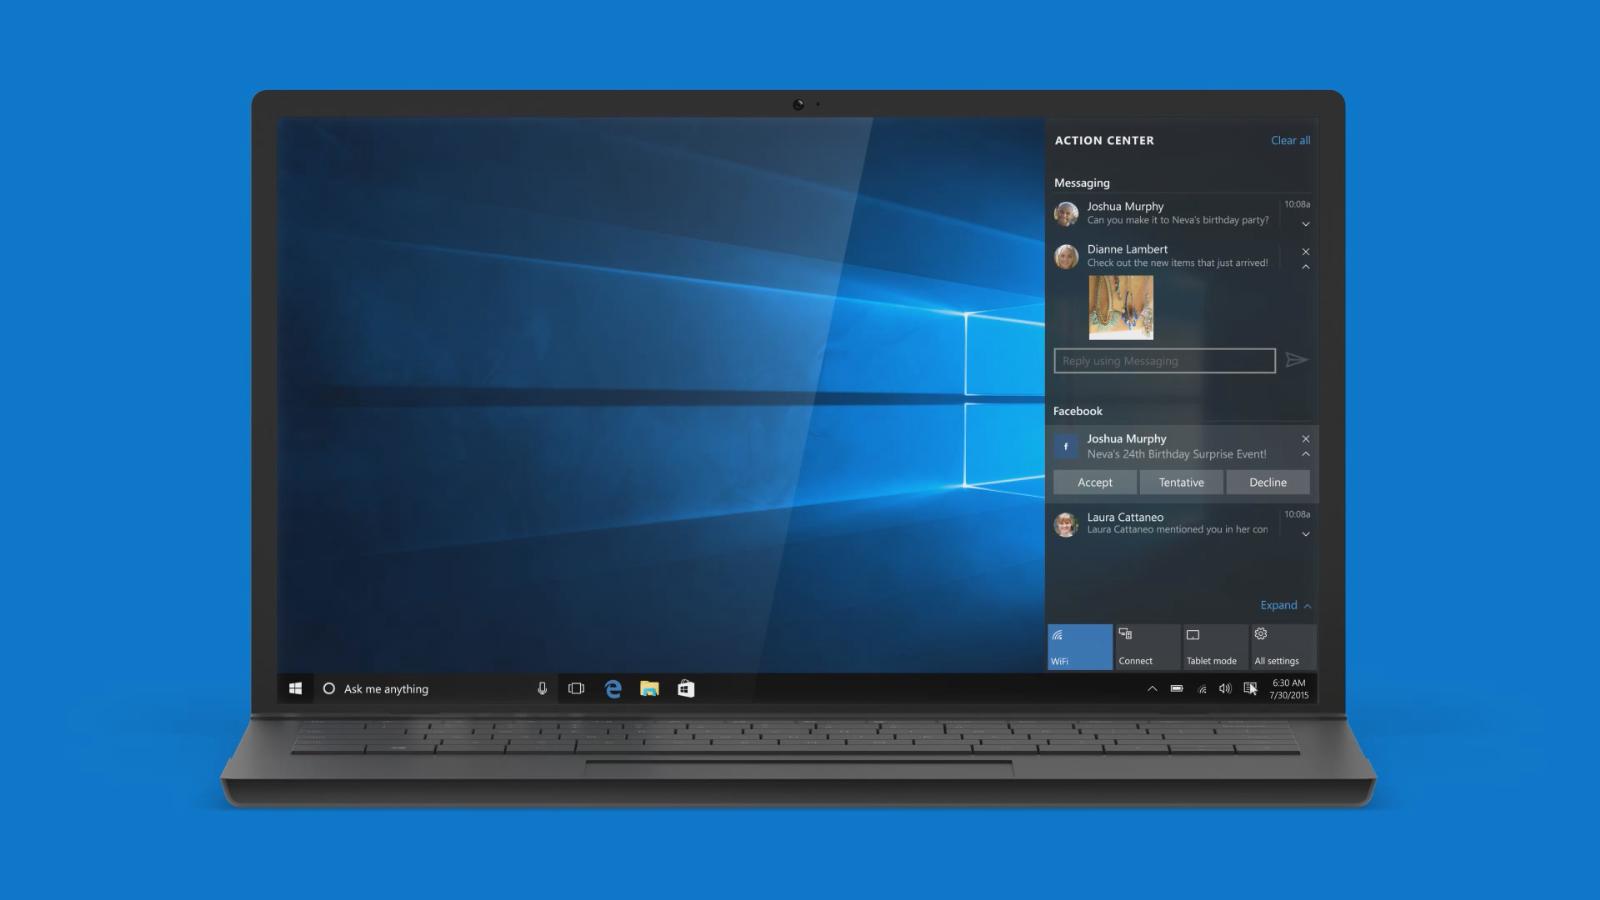 Windows 10 Messenger notification screenshot leak